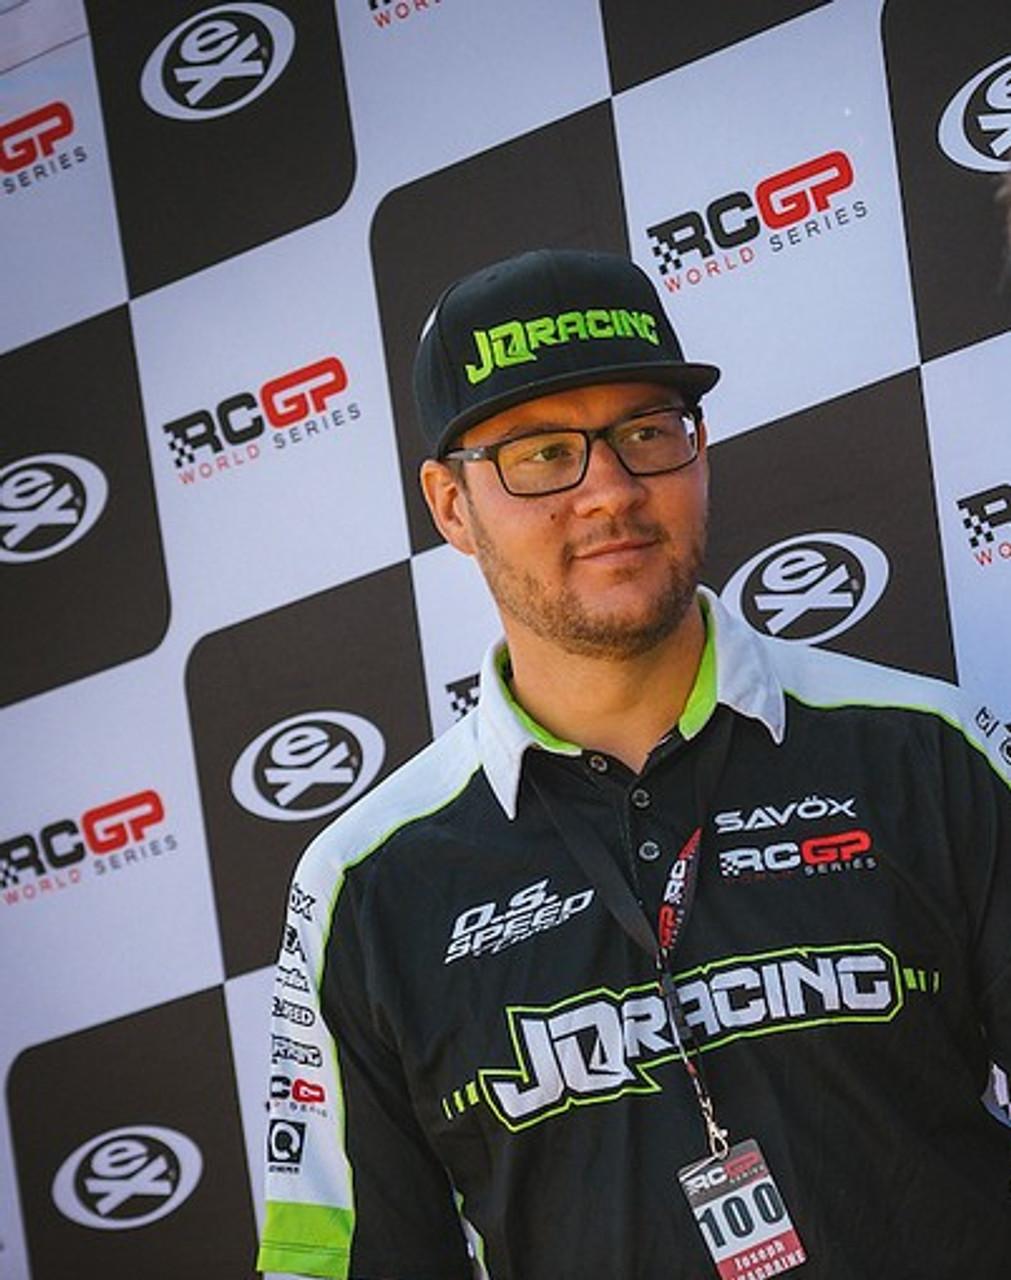 JQ Racing 2019 RCGP Collard Dye-Sub Team Shirt (X-Large)